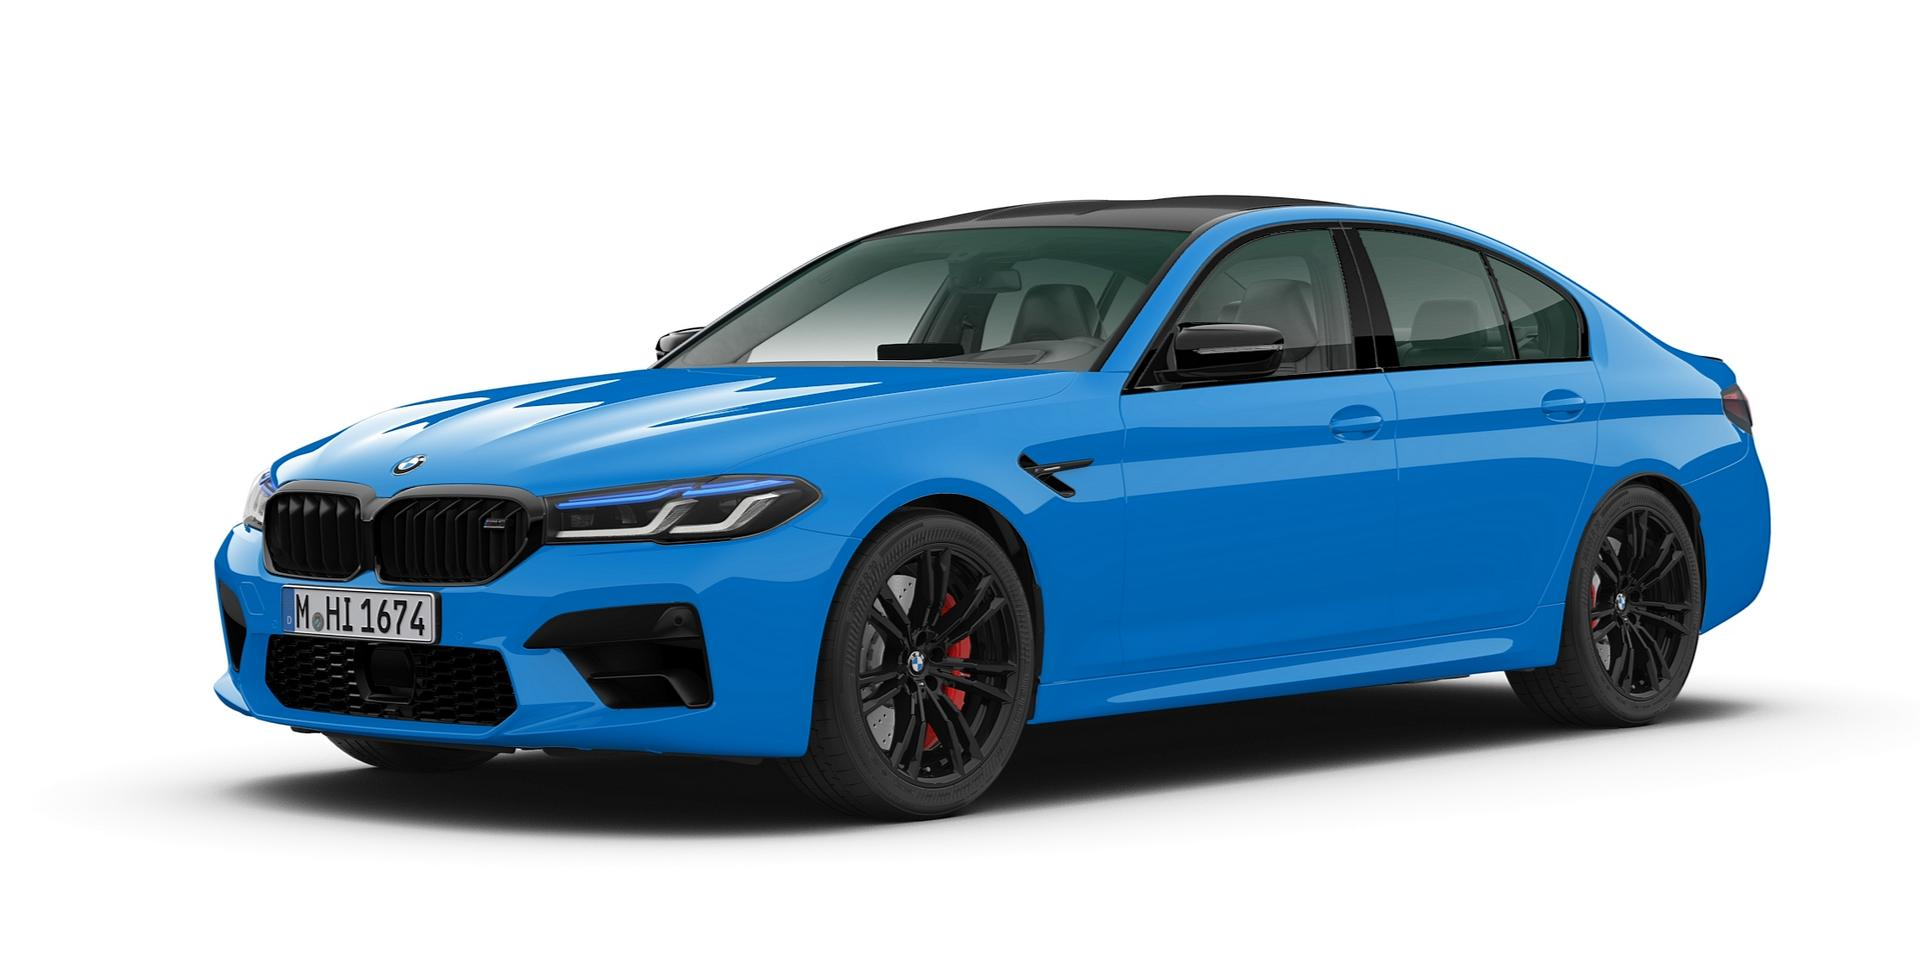 Voodoo Blue BMW M5 CP